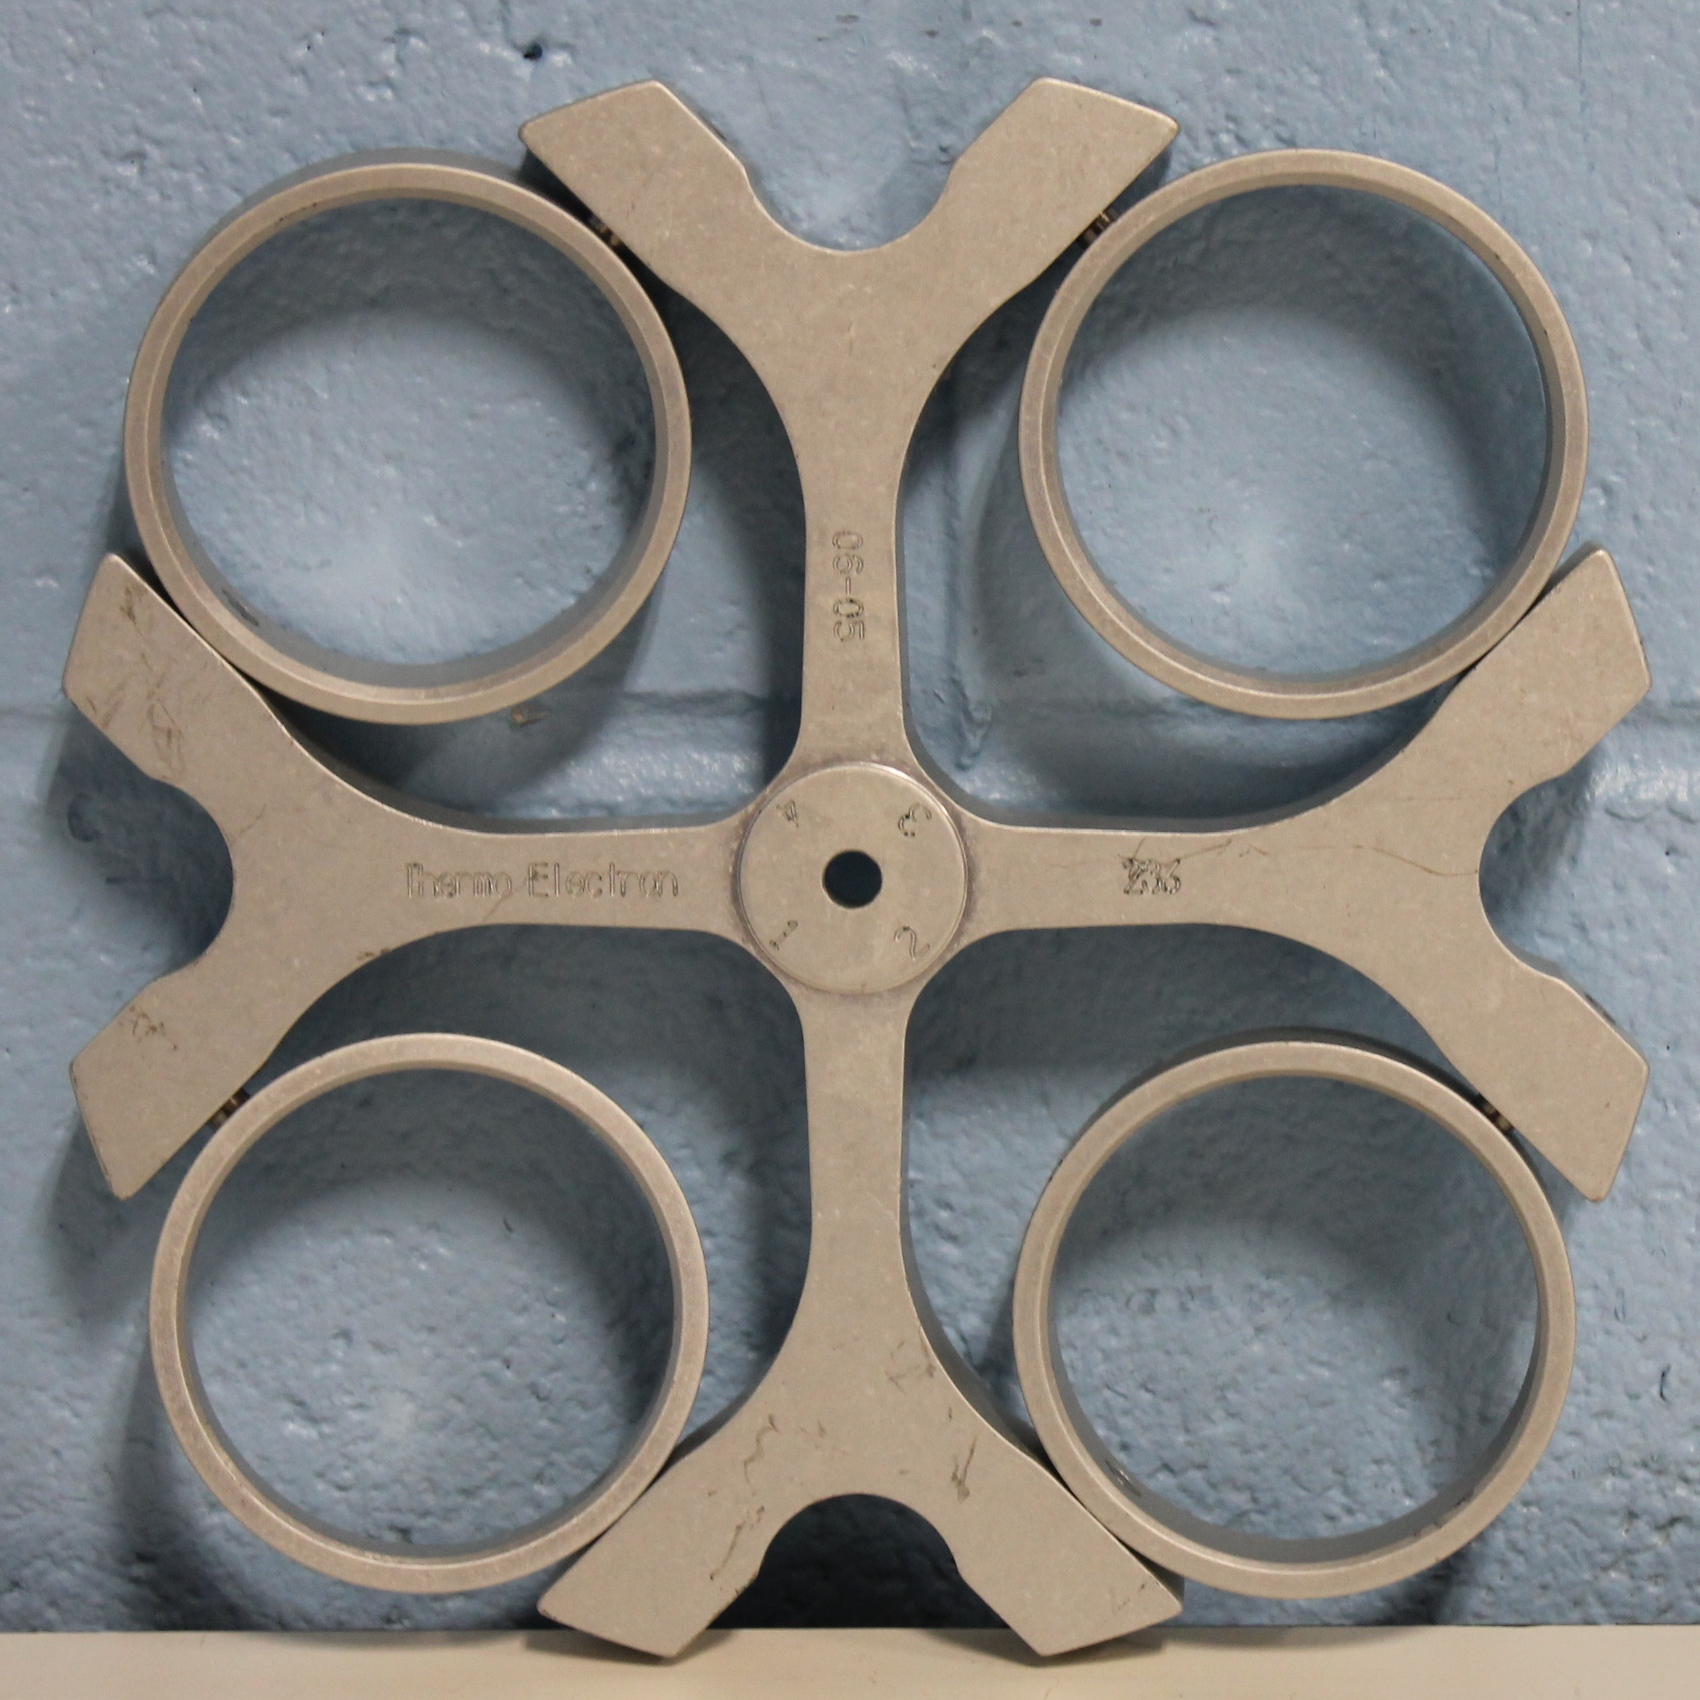 IEC Centra 236 Rotor Image